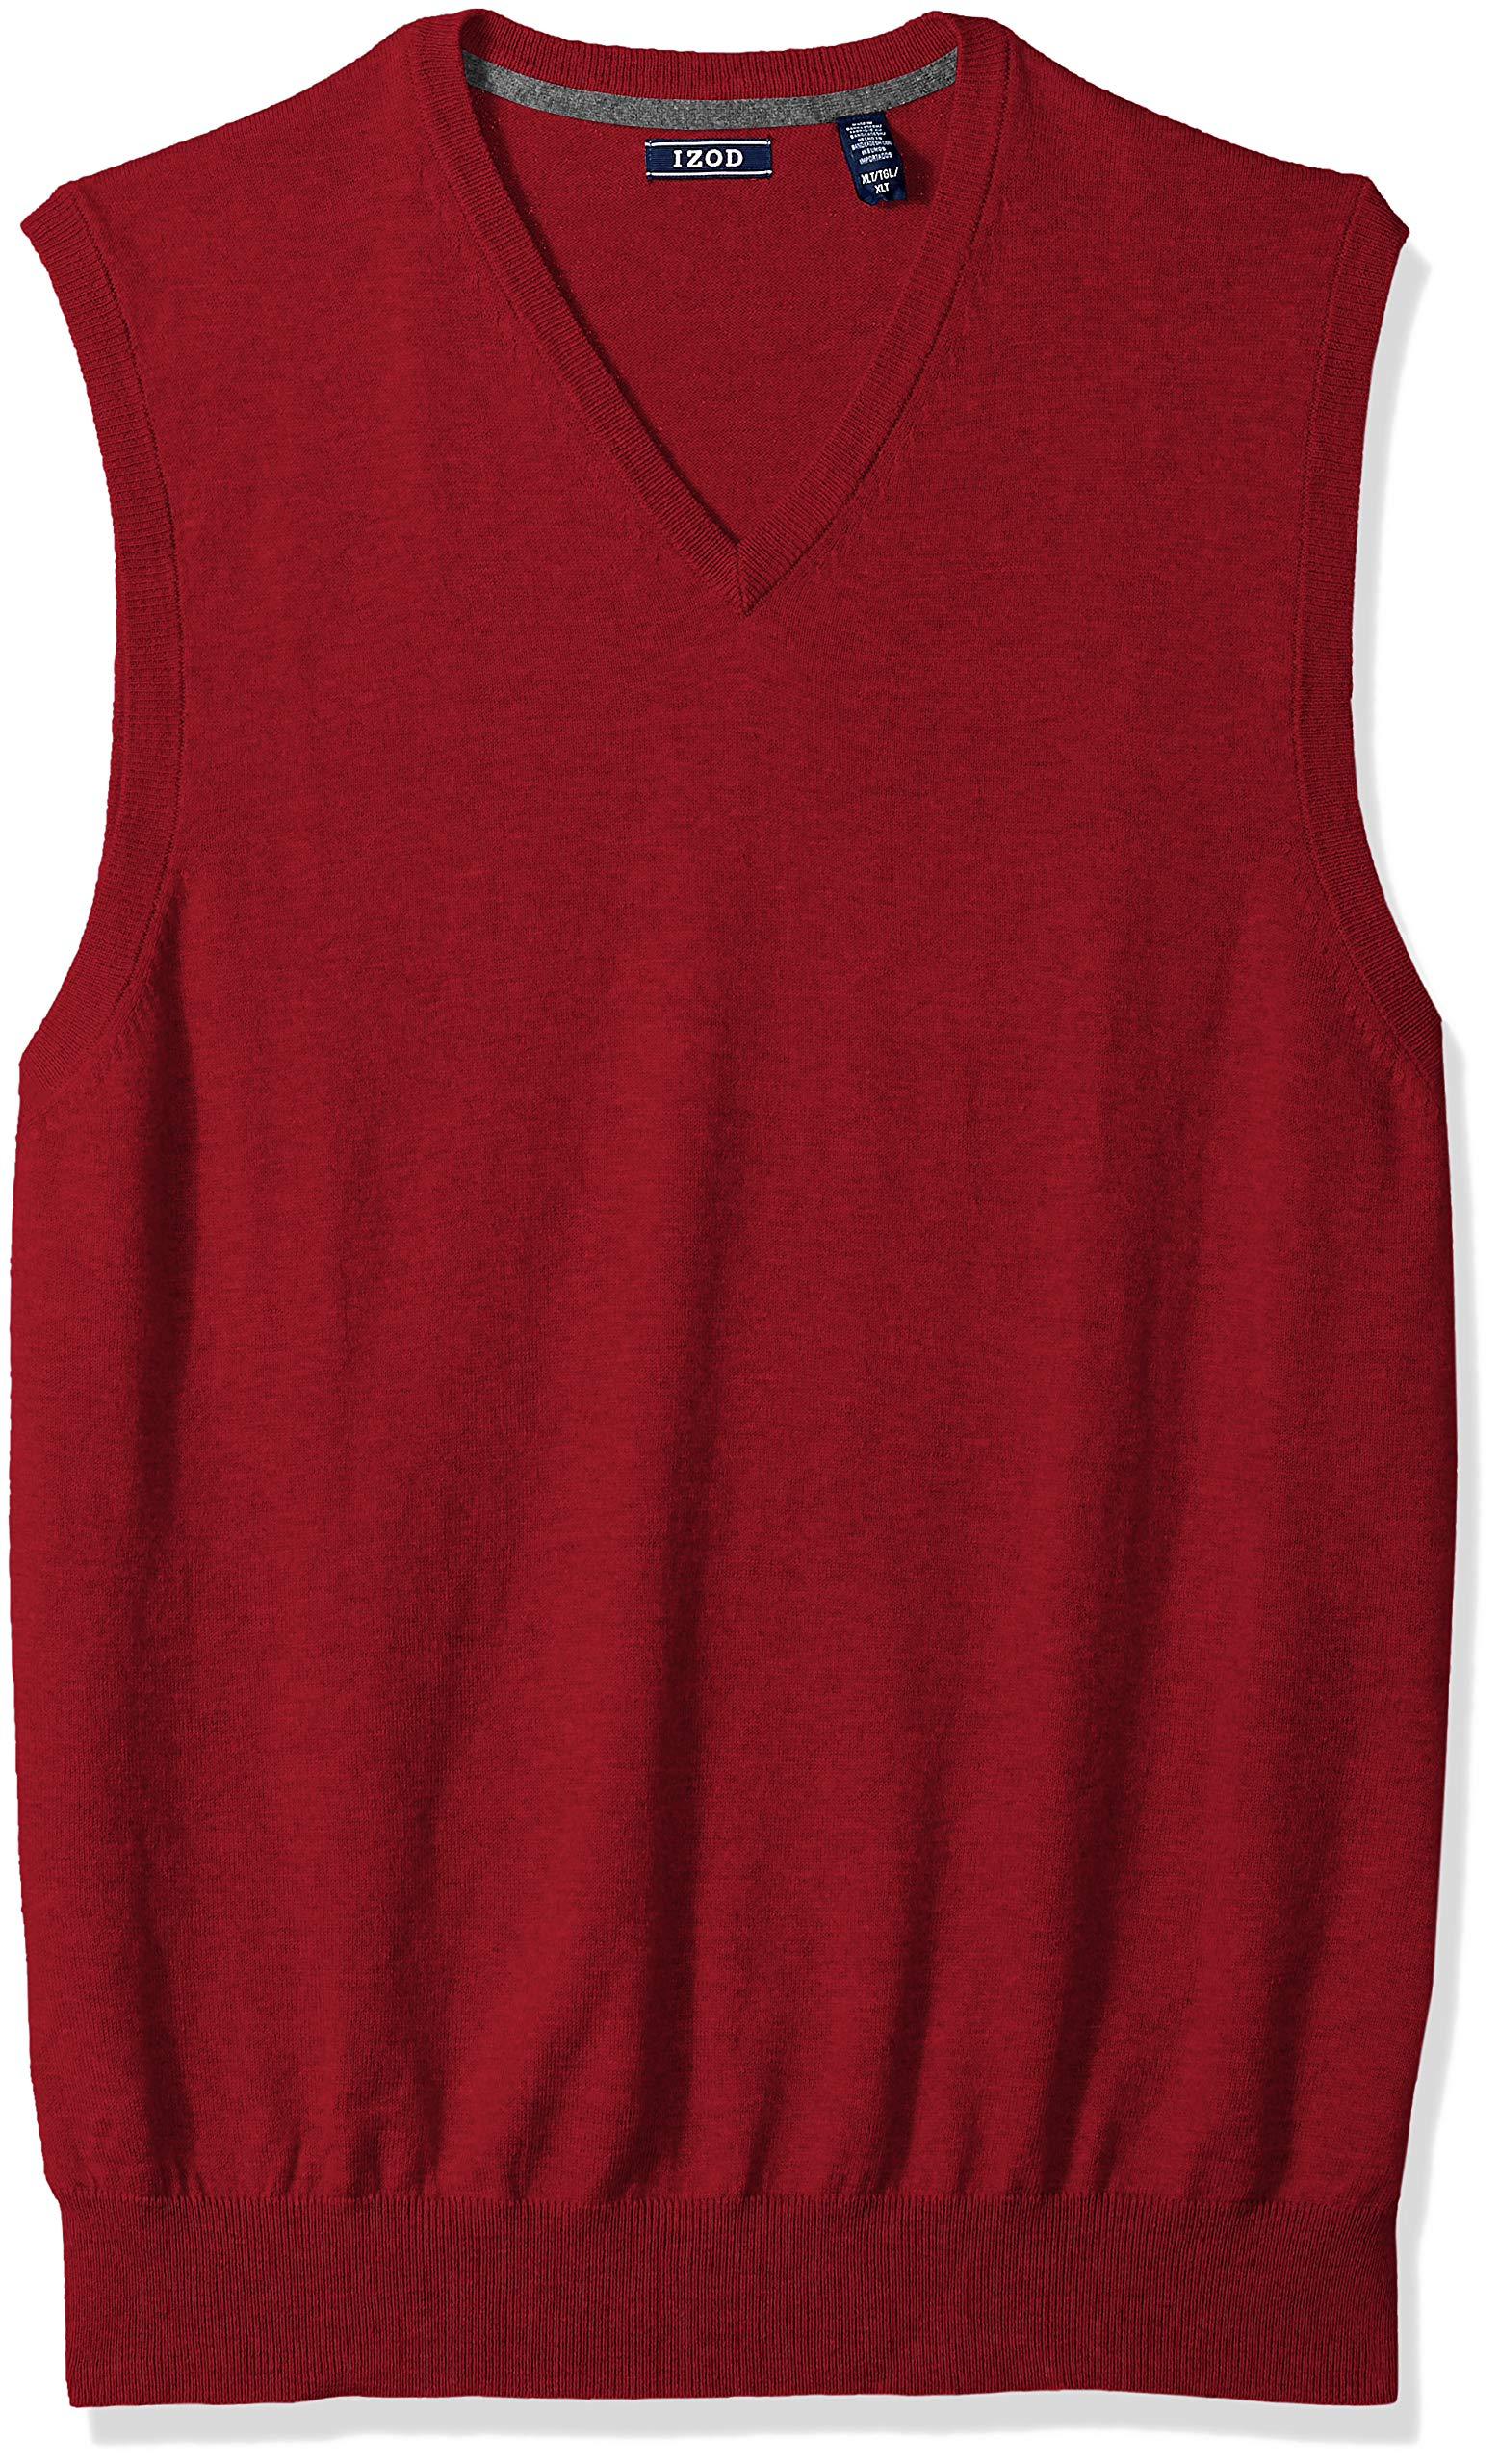 IZOD Men's Big and Tall Premium Essentials Solid V-Neck 12 Gauge Sweater Vest, New Biking red, 5X-Large